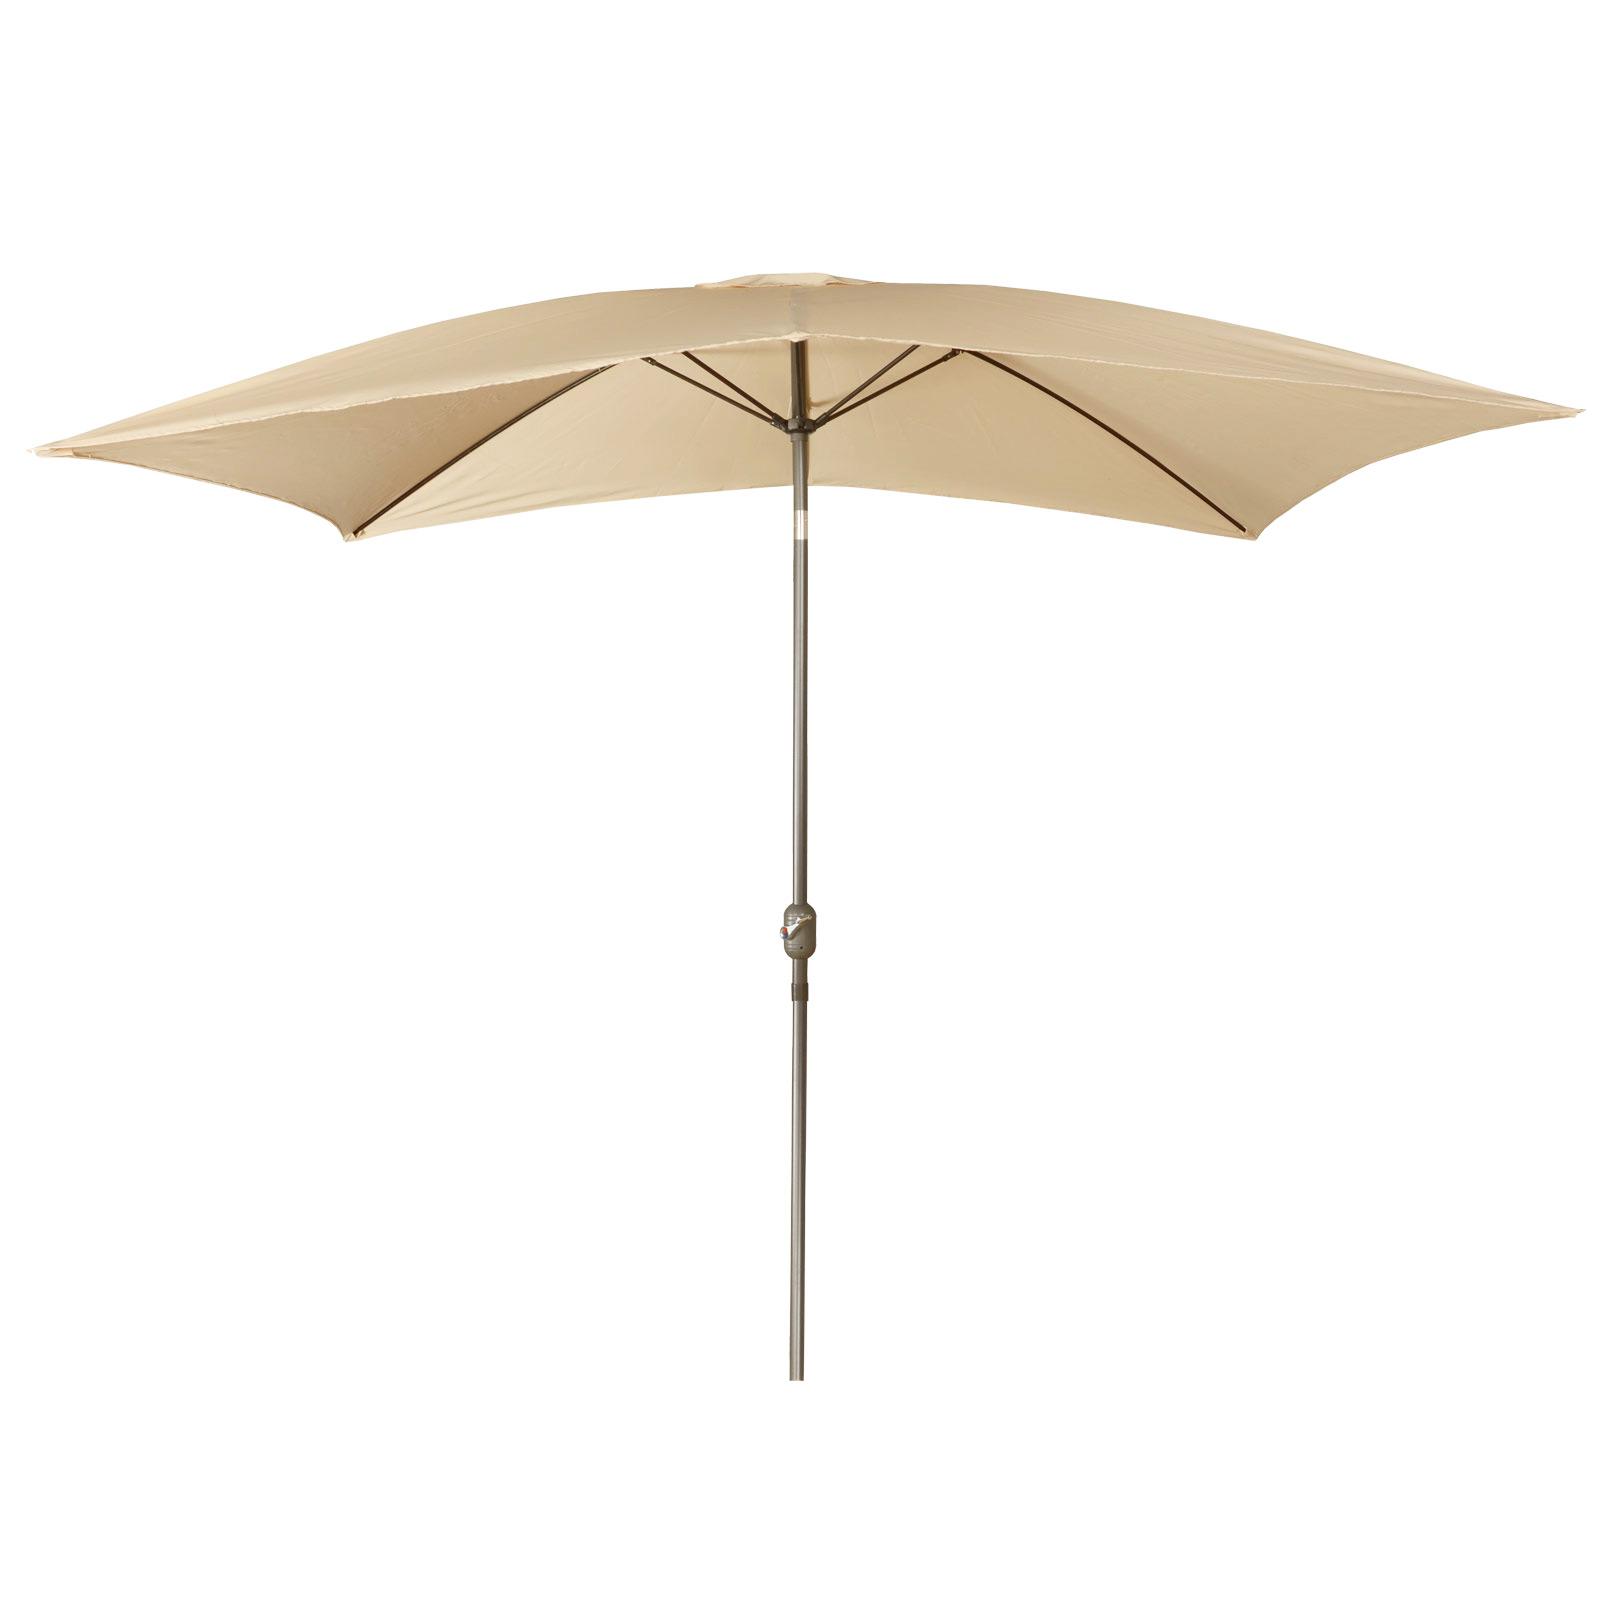 2m x 3m rectangular tilting canopy garden parasol sun for Canopy umbrella